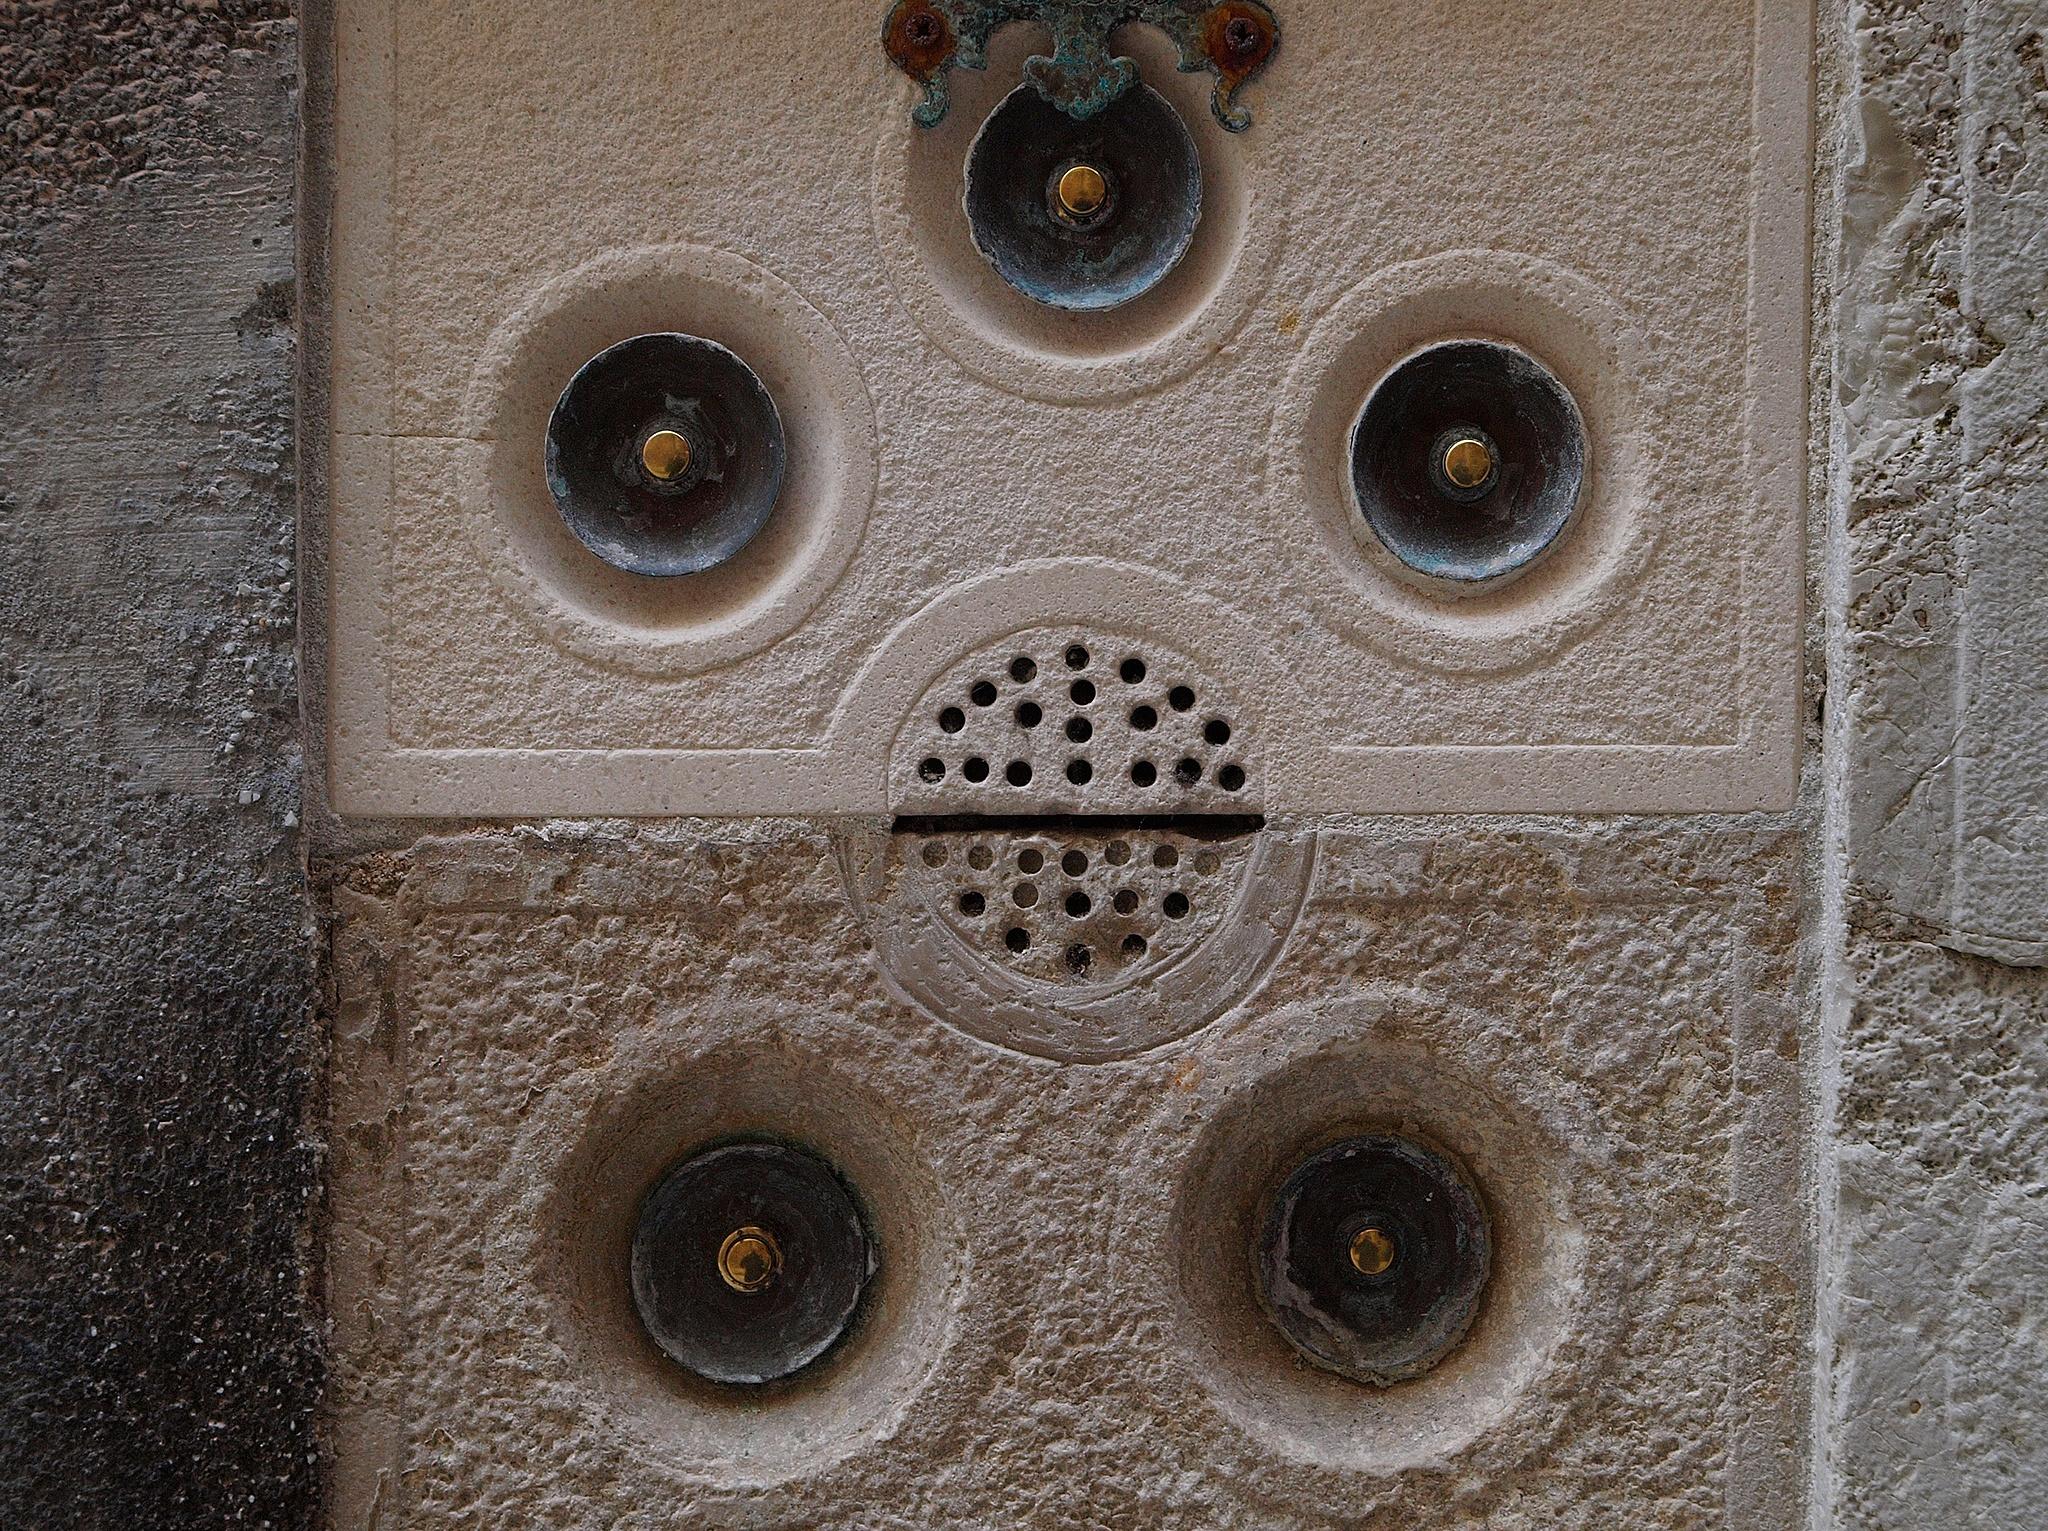 Doorbells in venice by Ganesh Neumair